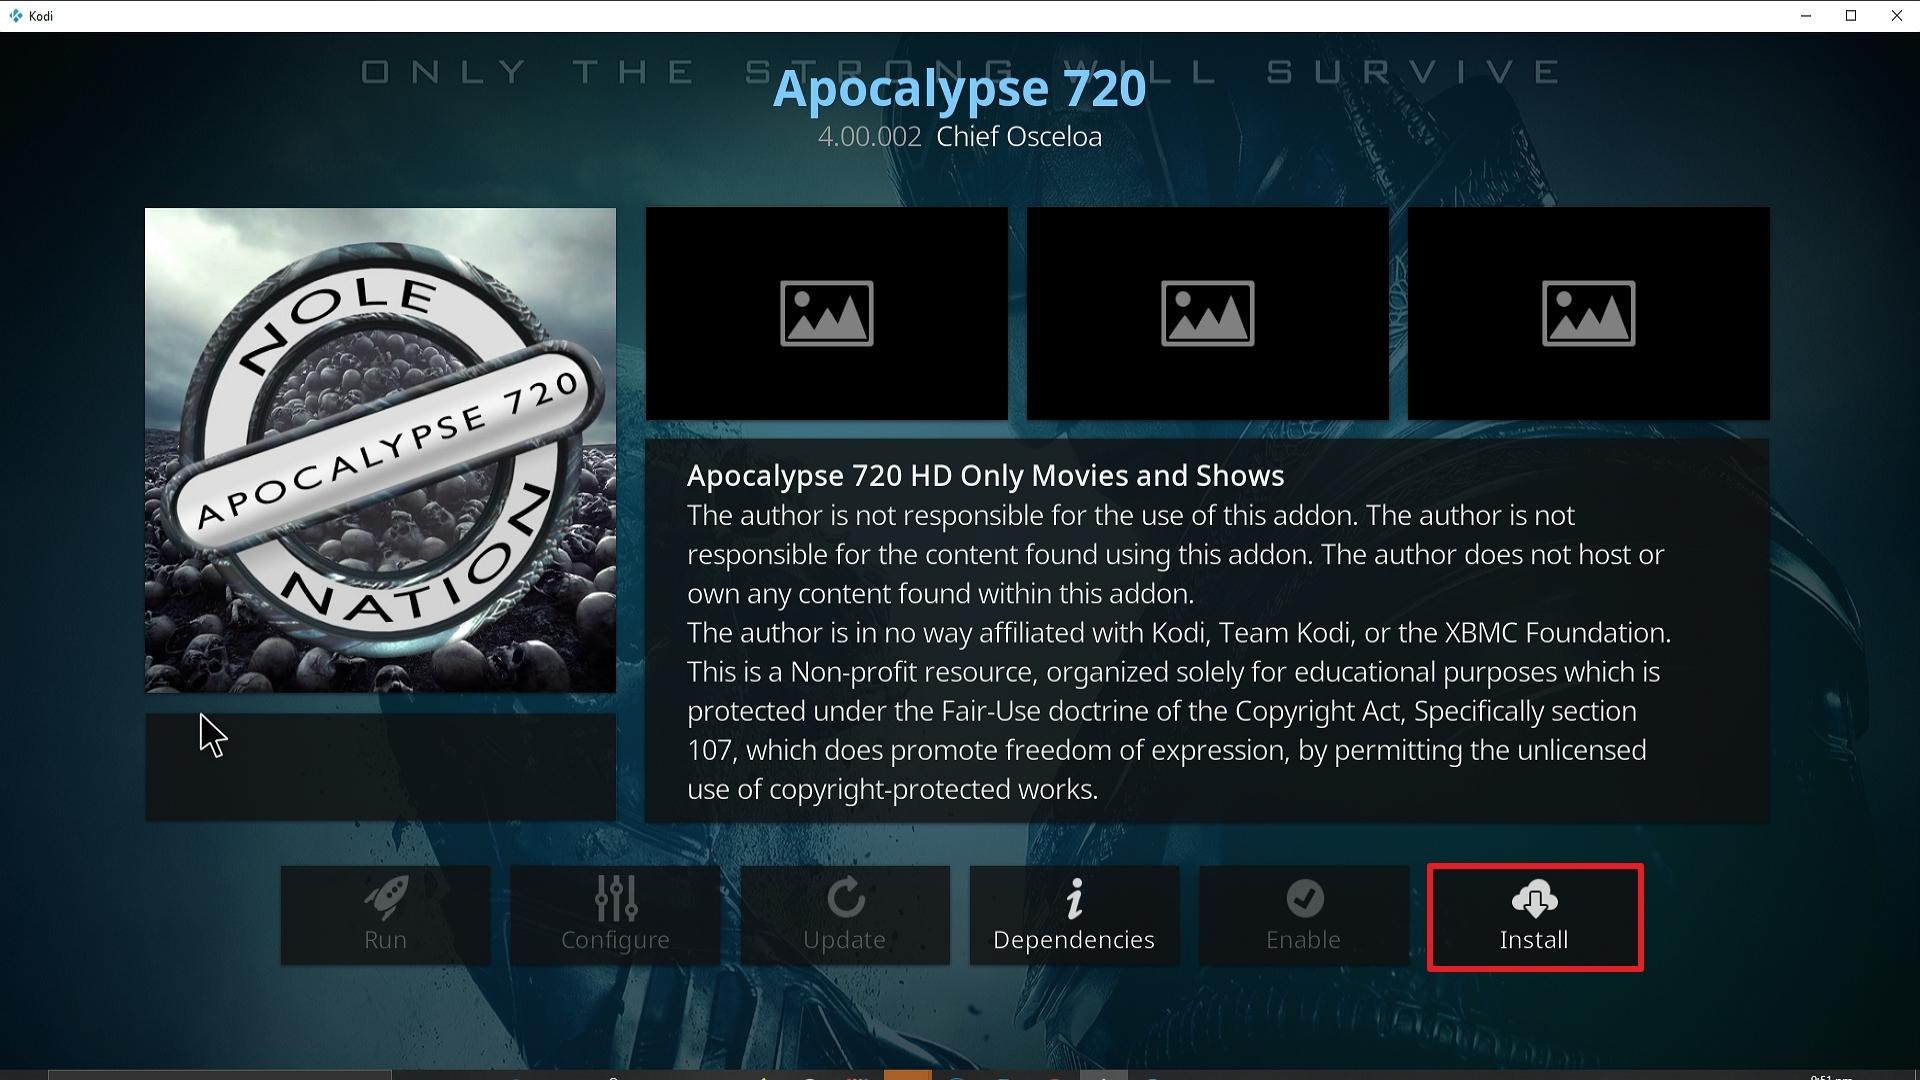 Step 23 Installing Apocalypse 720 addon on Kodi